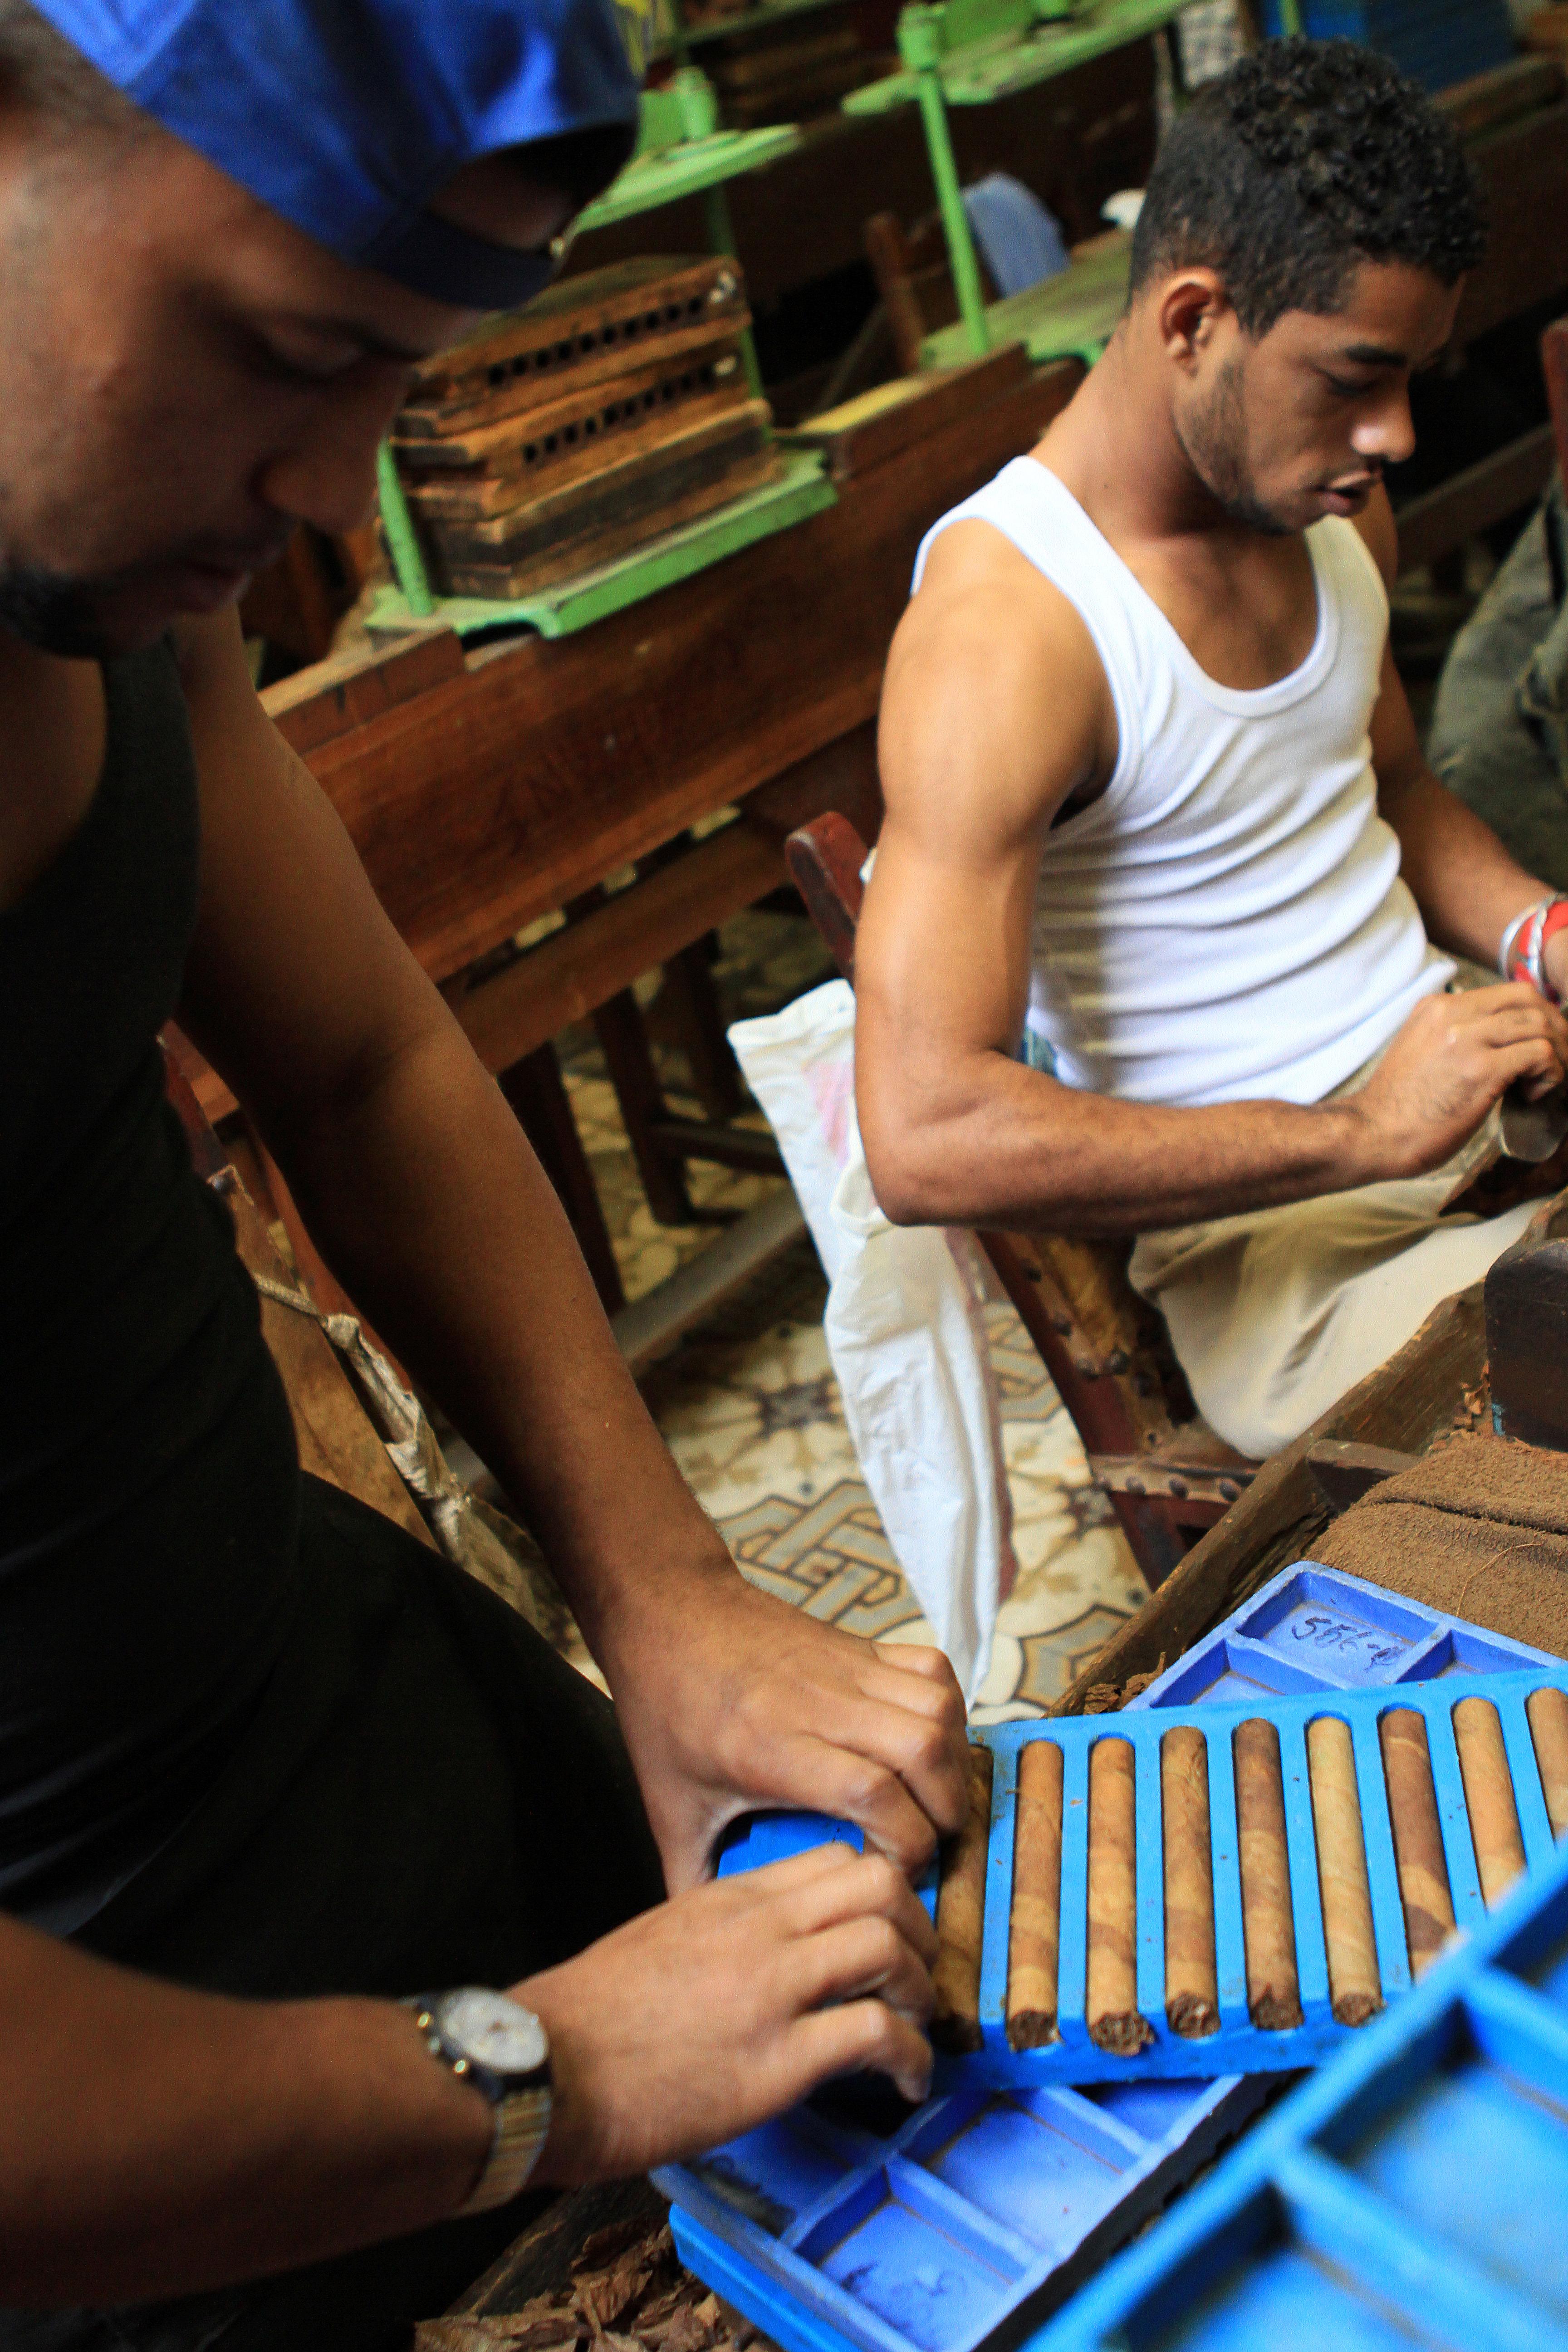 Pinar del Rio, Cuba 2014